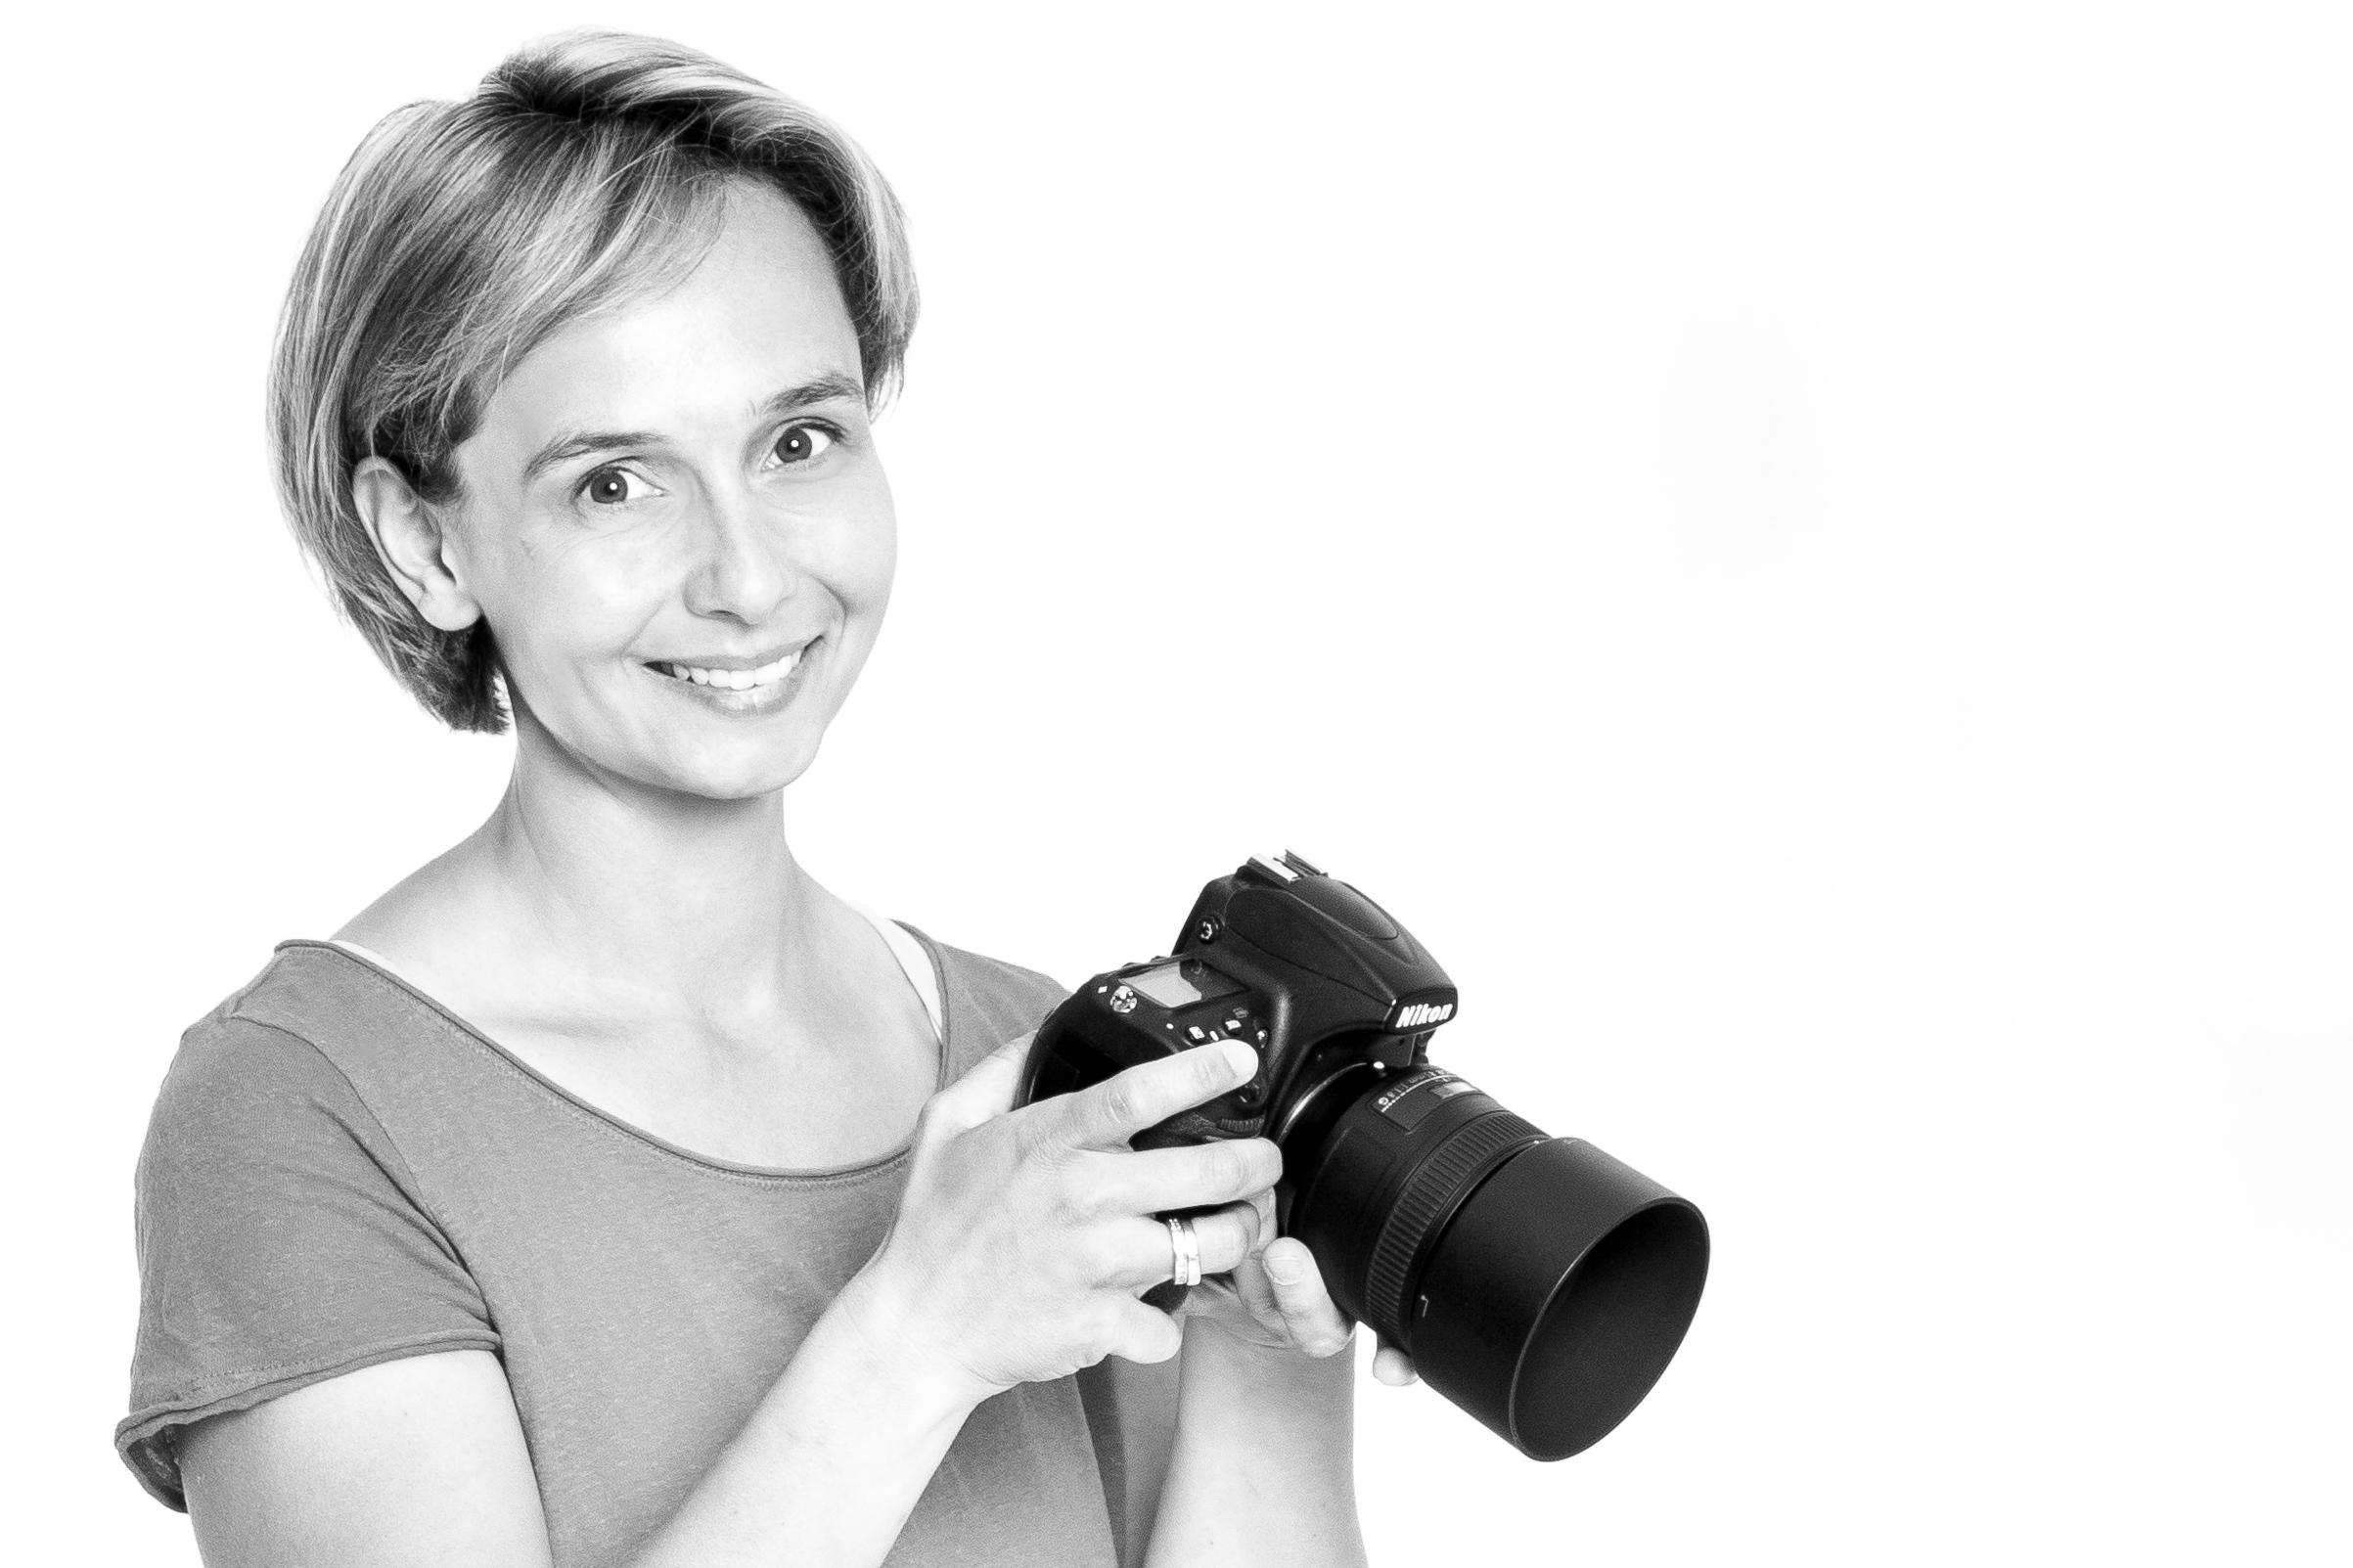 Silke mit Kamera-7541